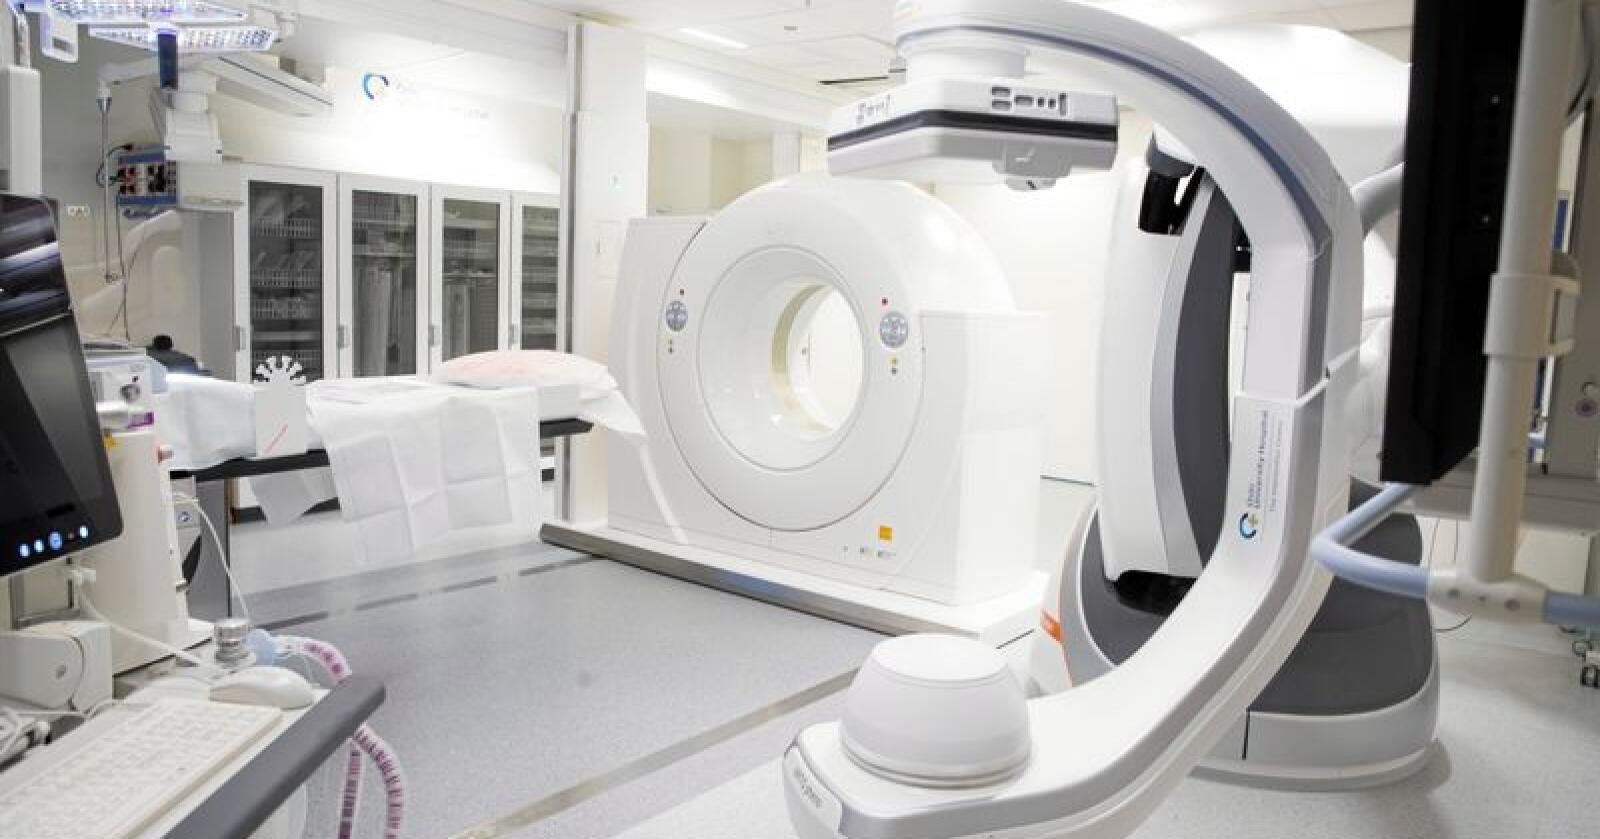 Flervalg: Er det ventetid ved Rikshospitalet, bør pasienter kunne ta røntgen hos private. Foto: Terje Pedersen / NTB scanpix